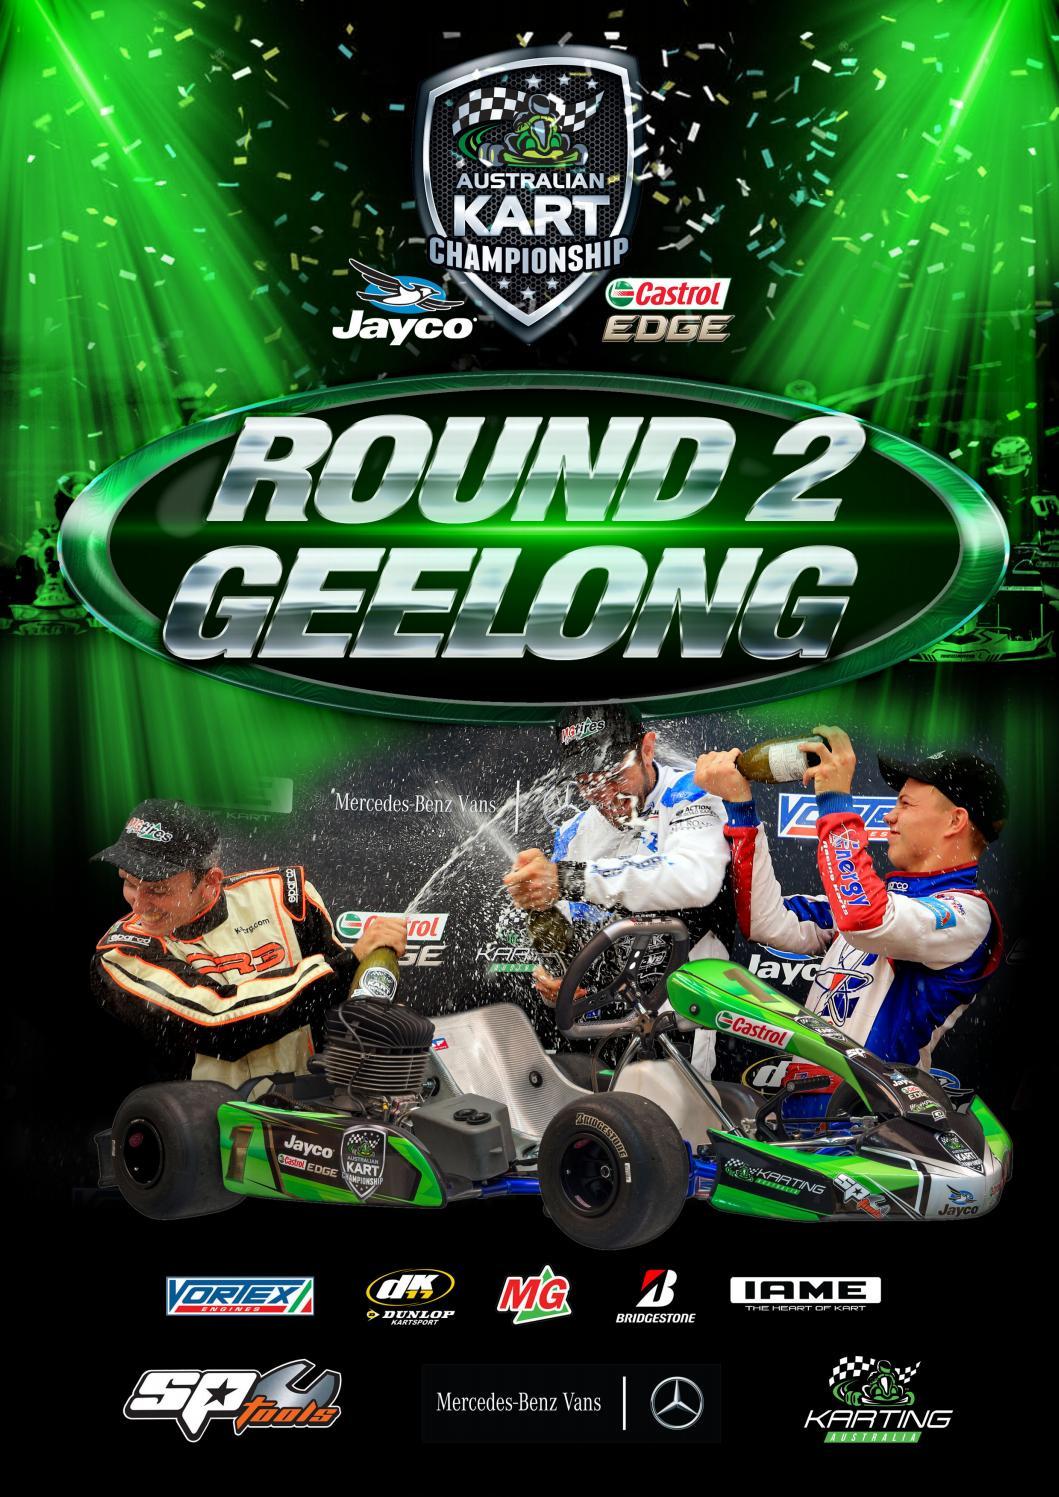 2017 Australian Kart Championship Round 2 Program by Karting